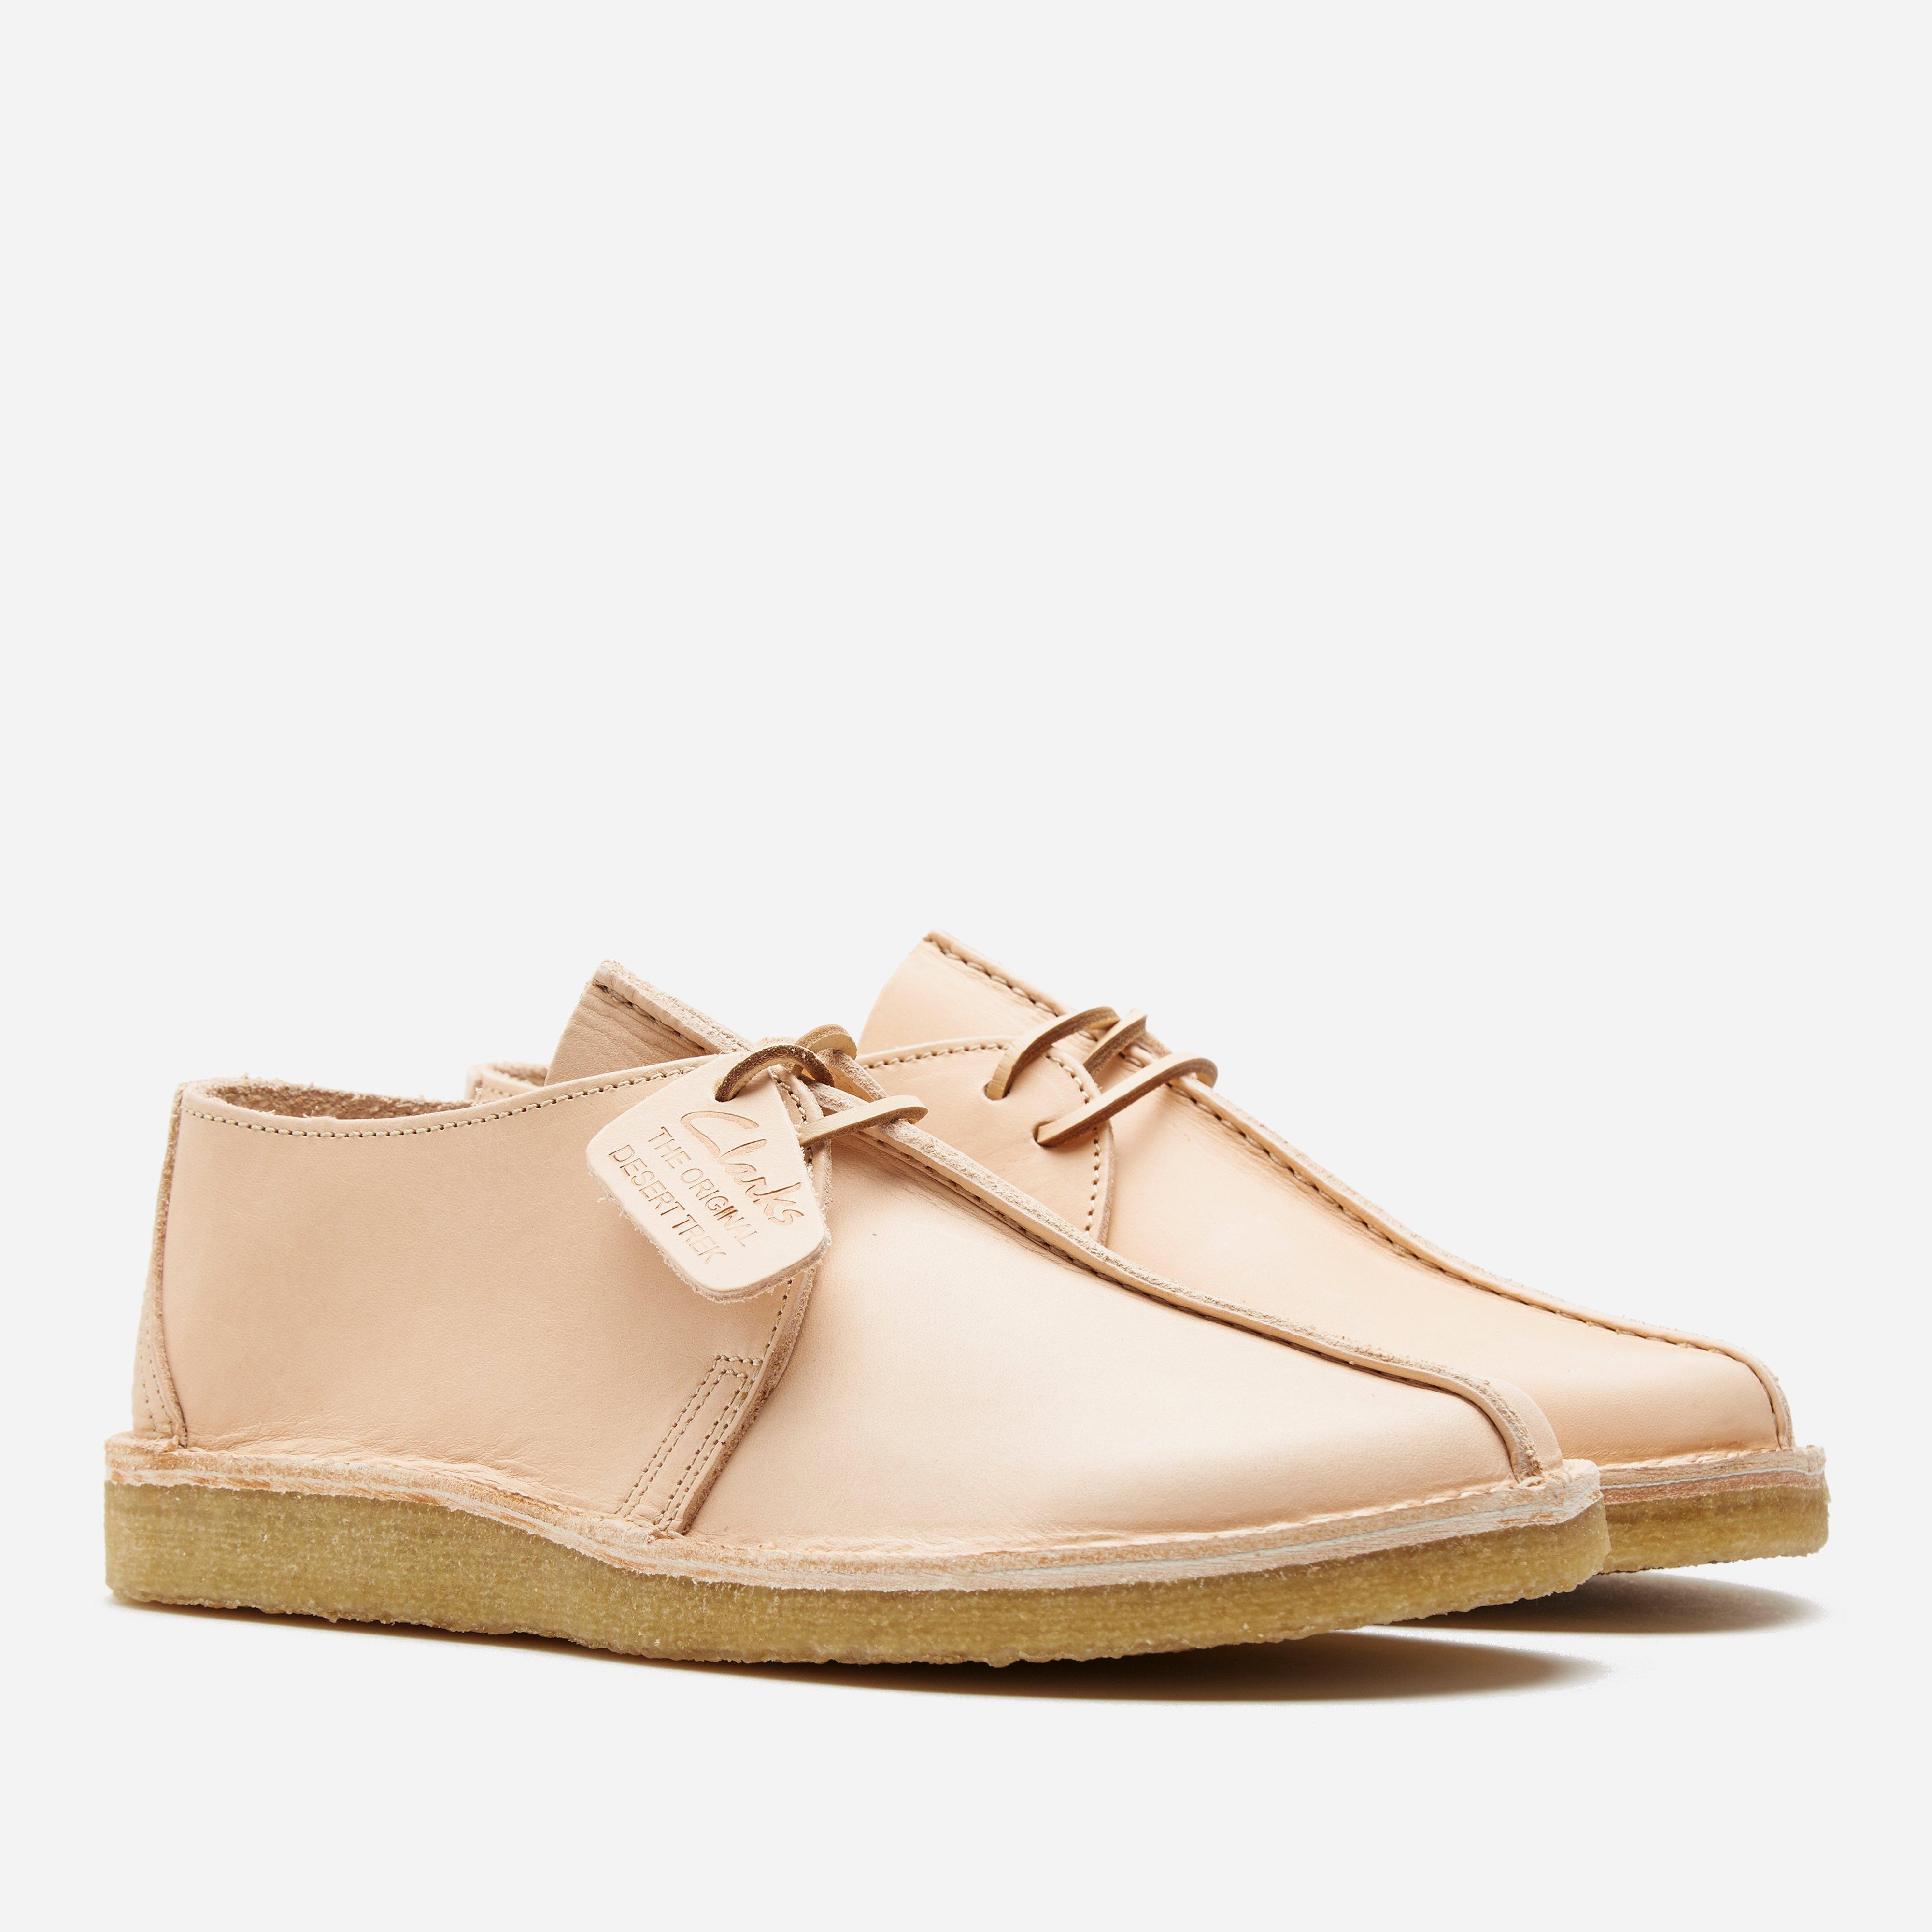 Clarks Originals Desert Trek Natural Tan Leather